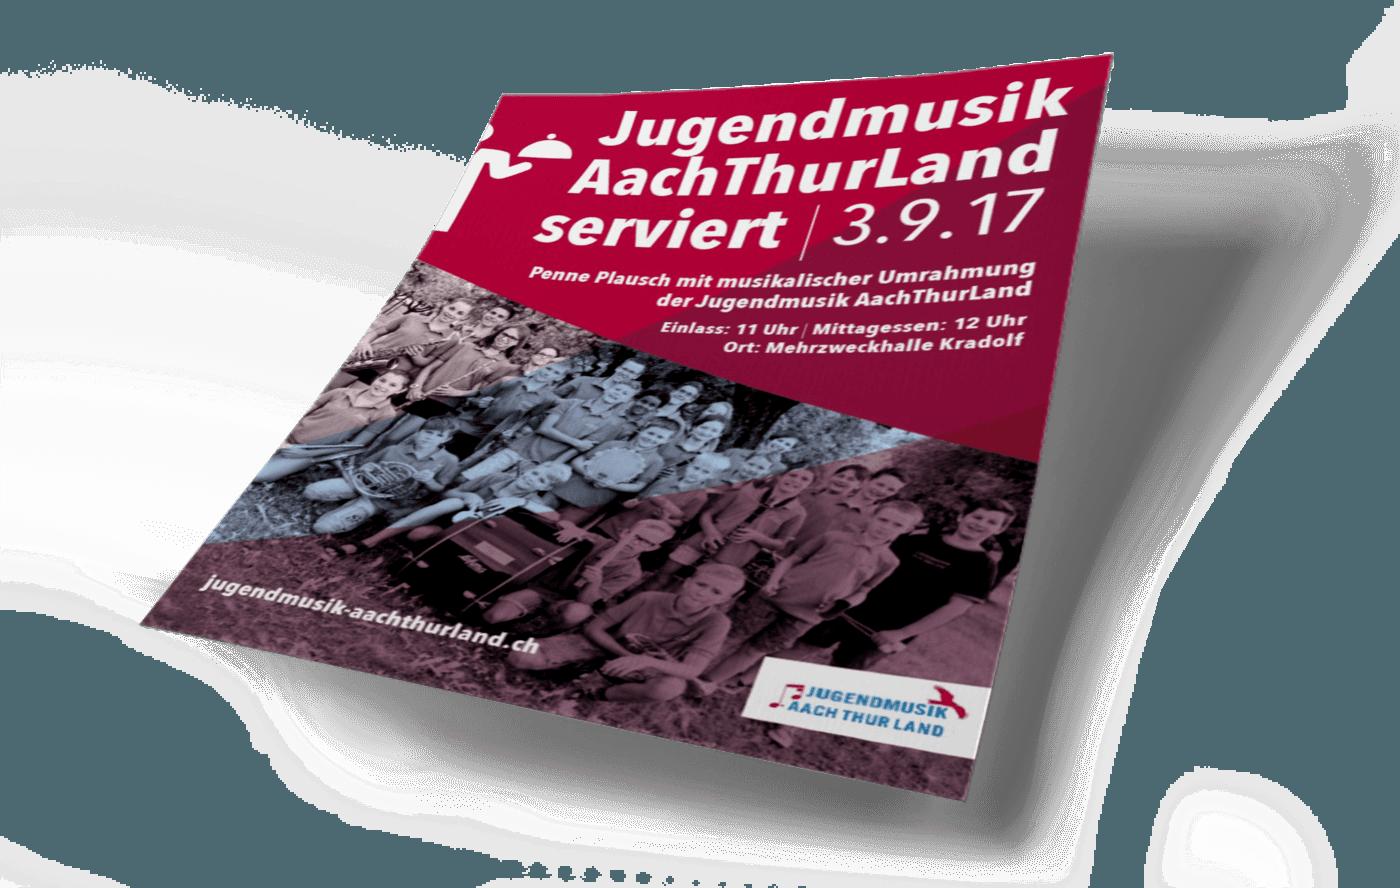 JUGENDMUSIK AACHTHURLAND – FLYER EVENT